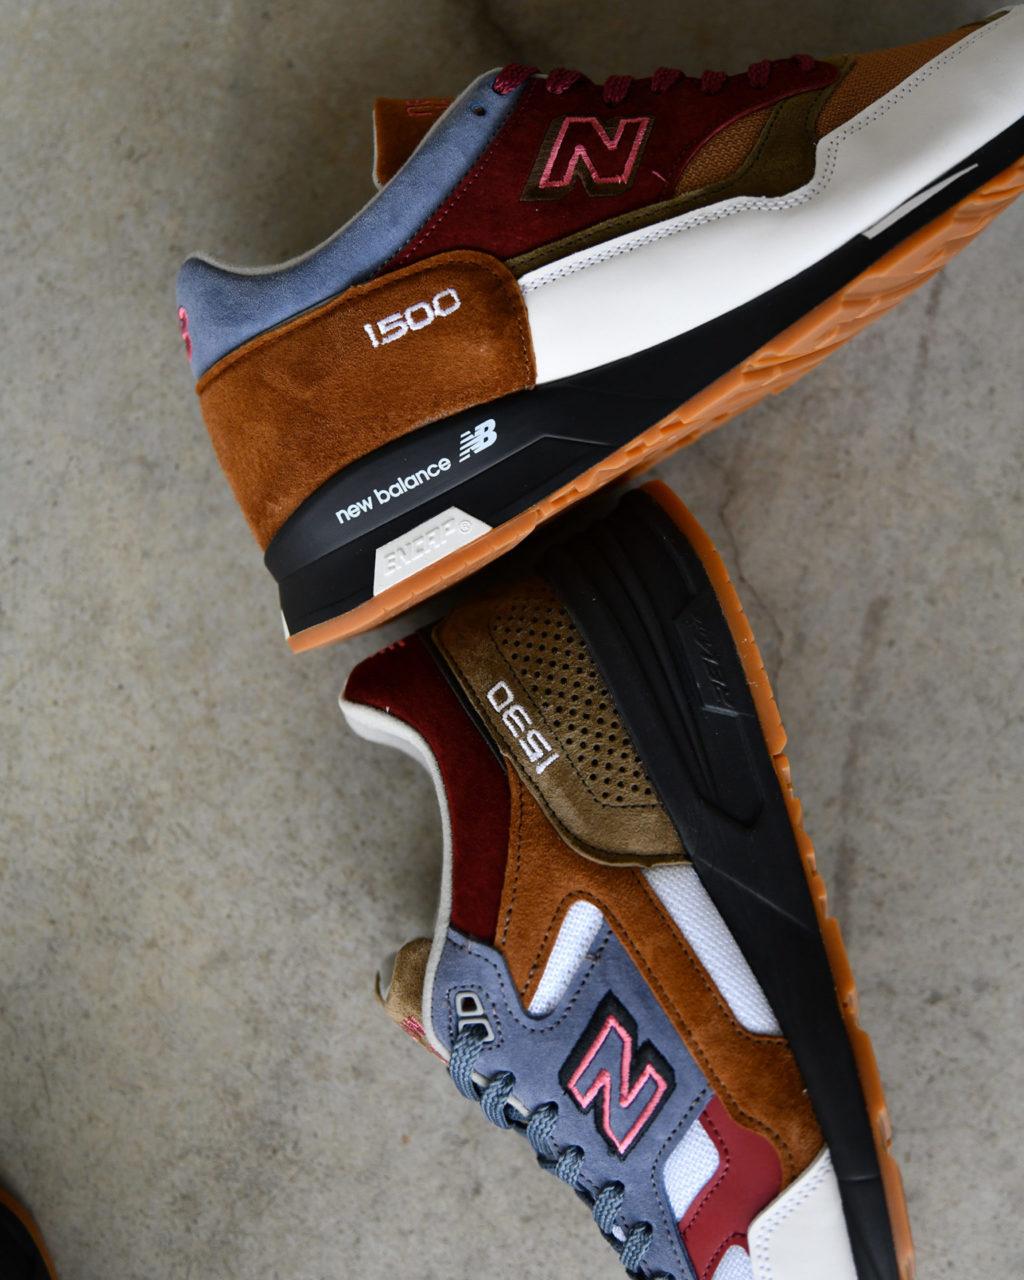 New Balance 1500 & 1530